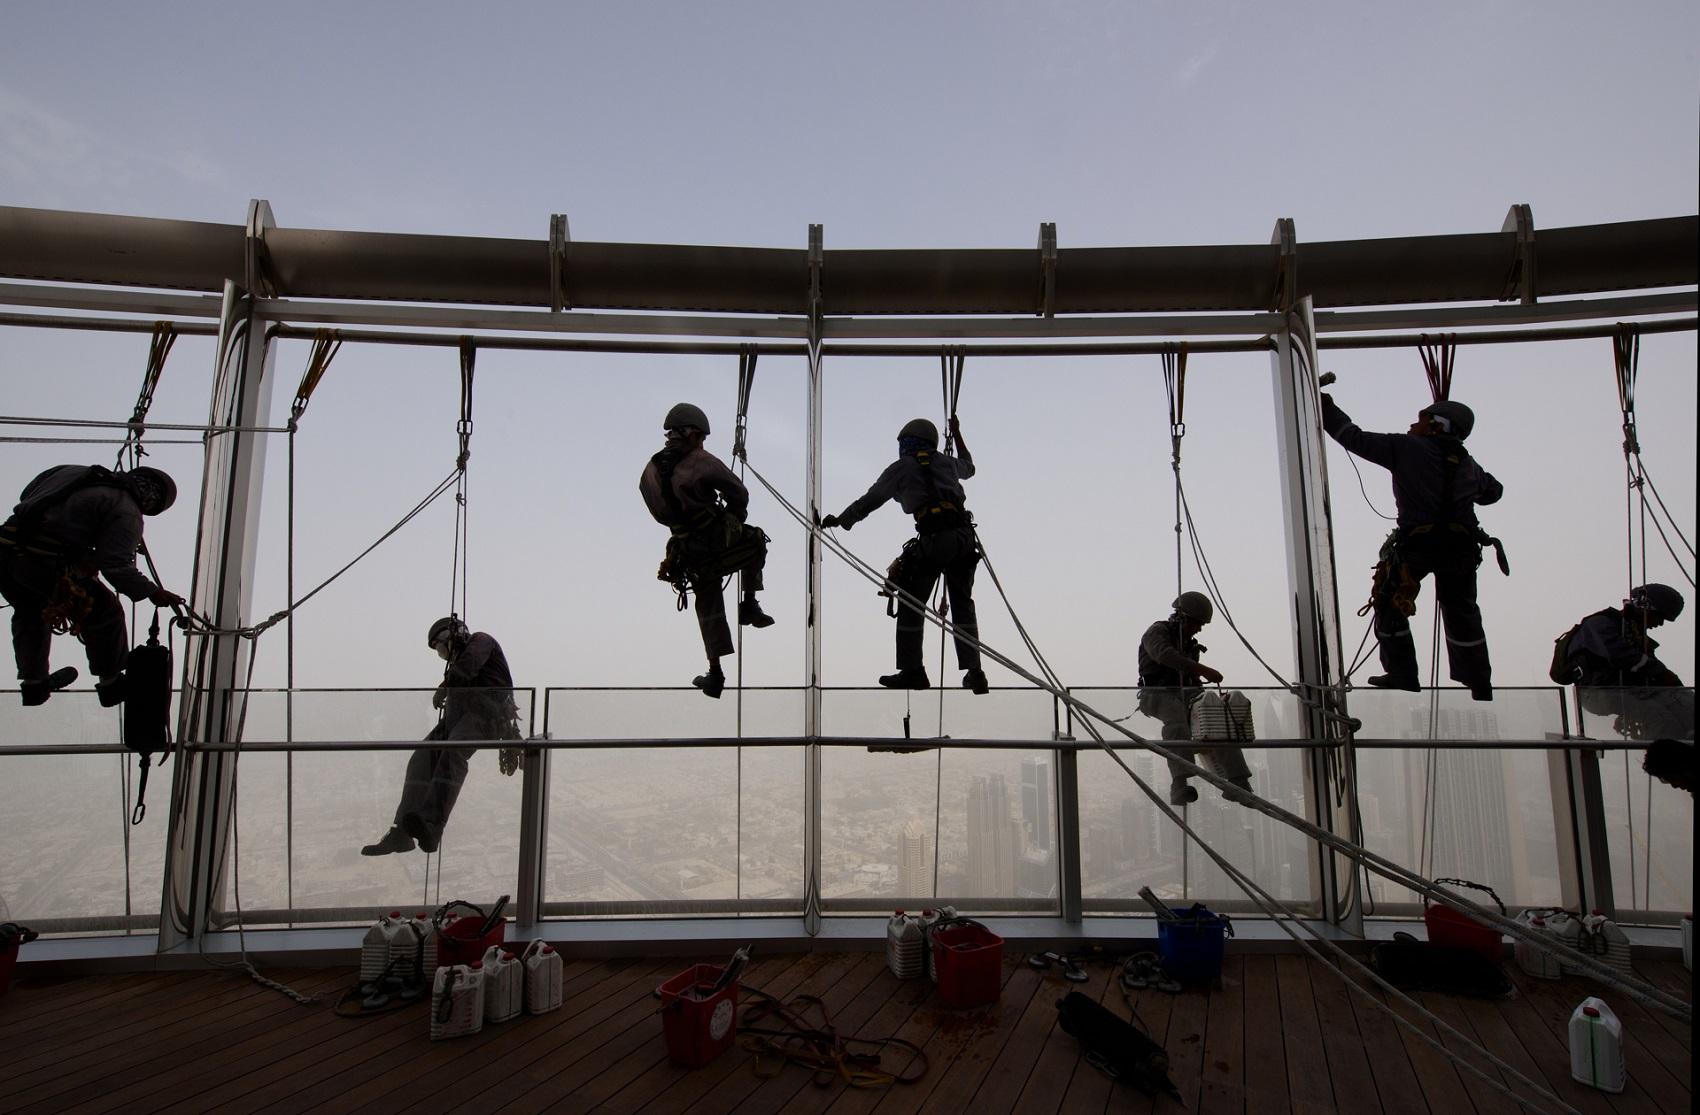 burj khalifa window cleaner